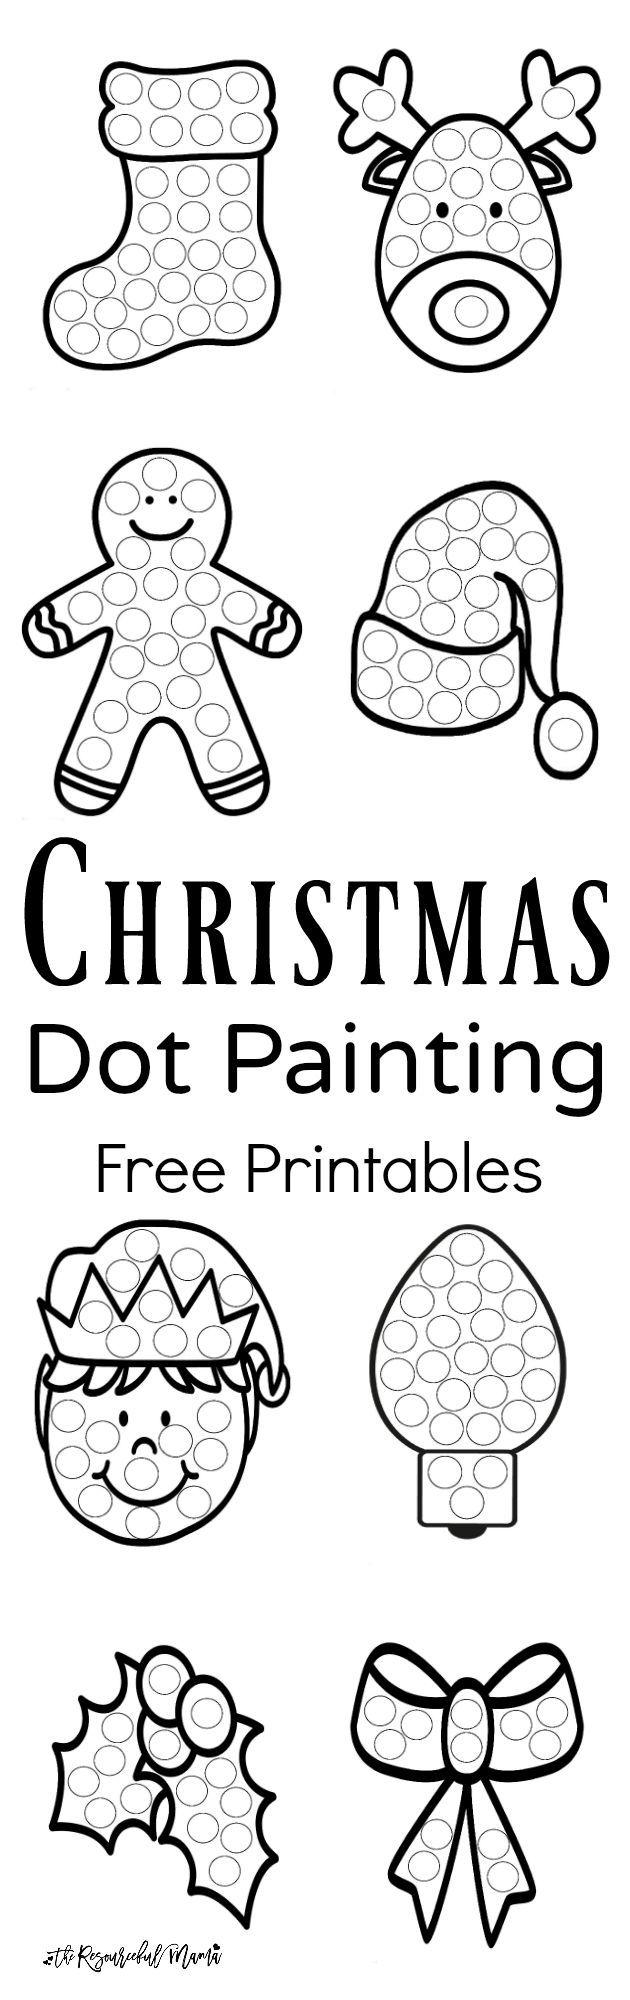 Uncategorized Preschool Christmas Worksheets best 20 preschool christmas ideas on pinterest dot painting free printables